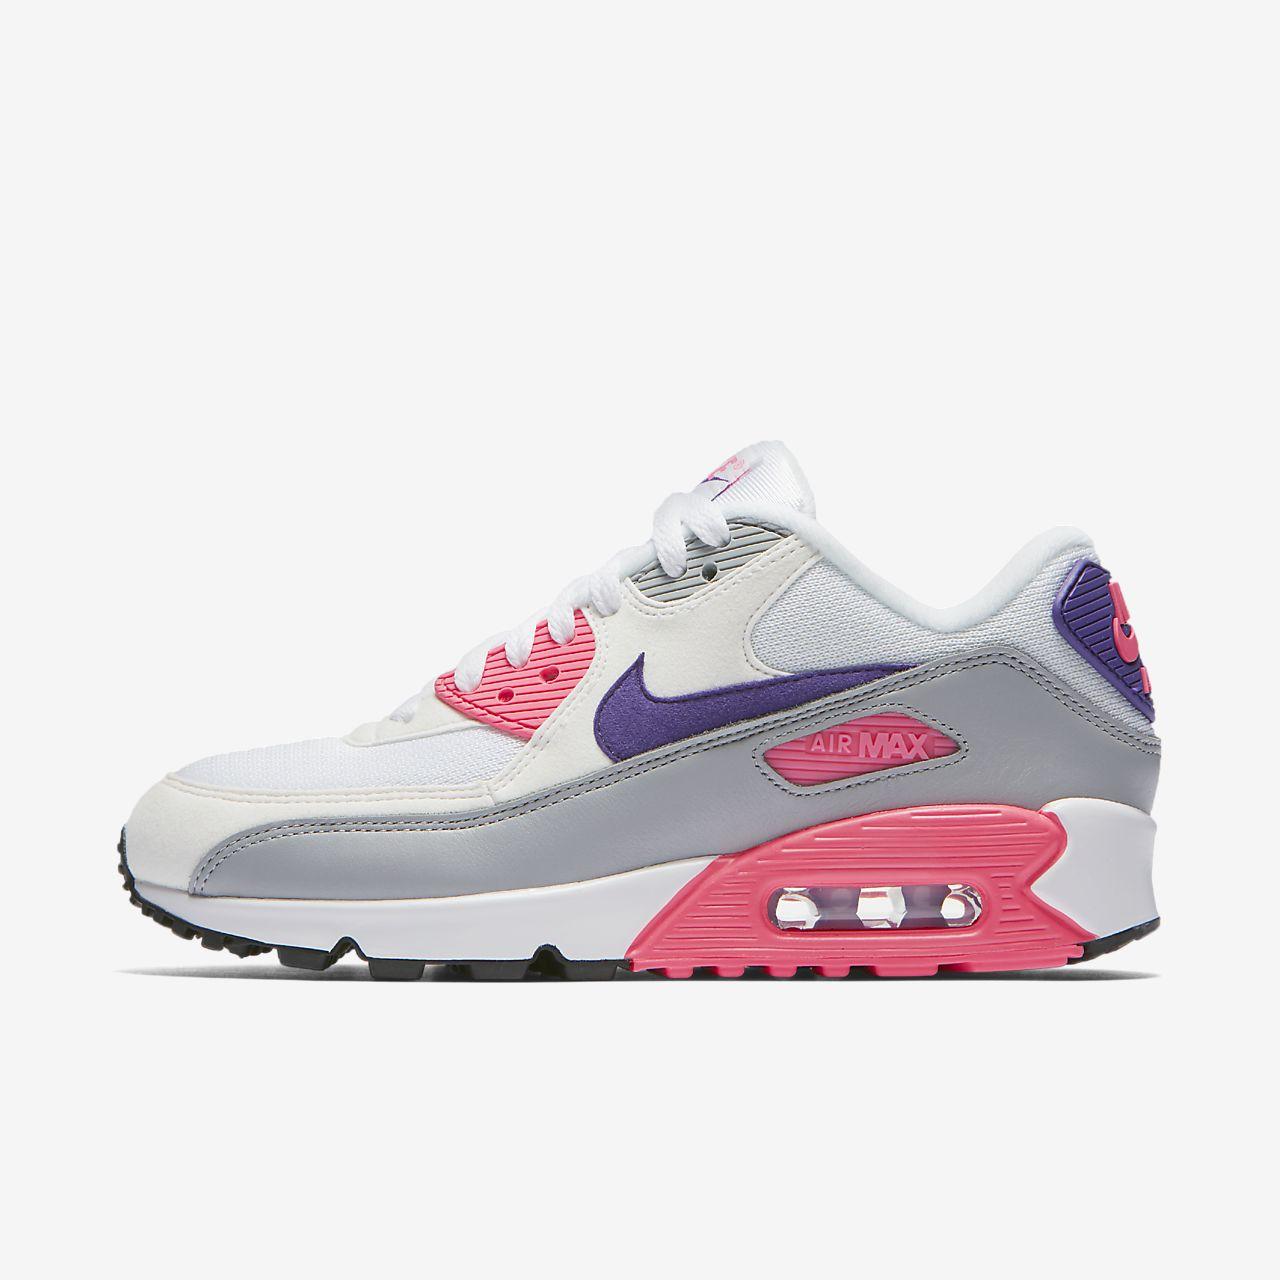 5bb3ac481c5f ... where to buy chaussure nike air max 90 pour femme 4e17e 3b8f1